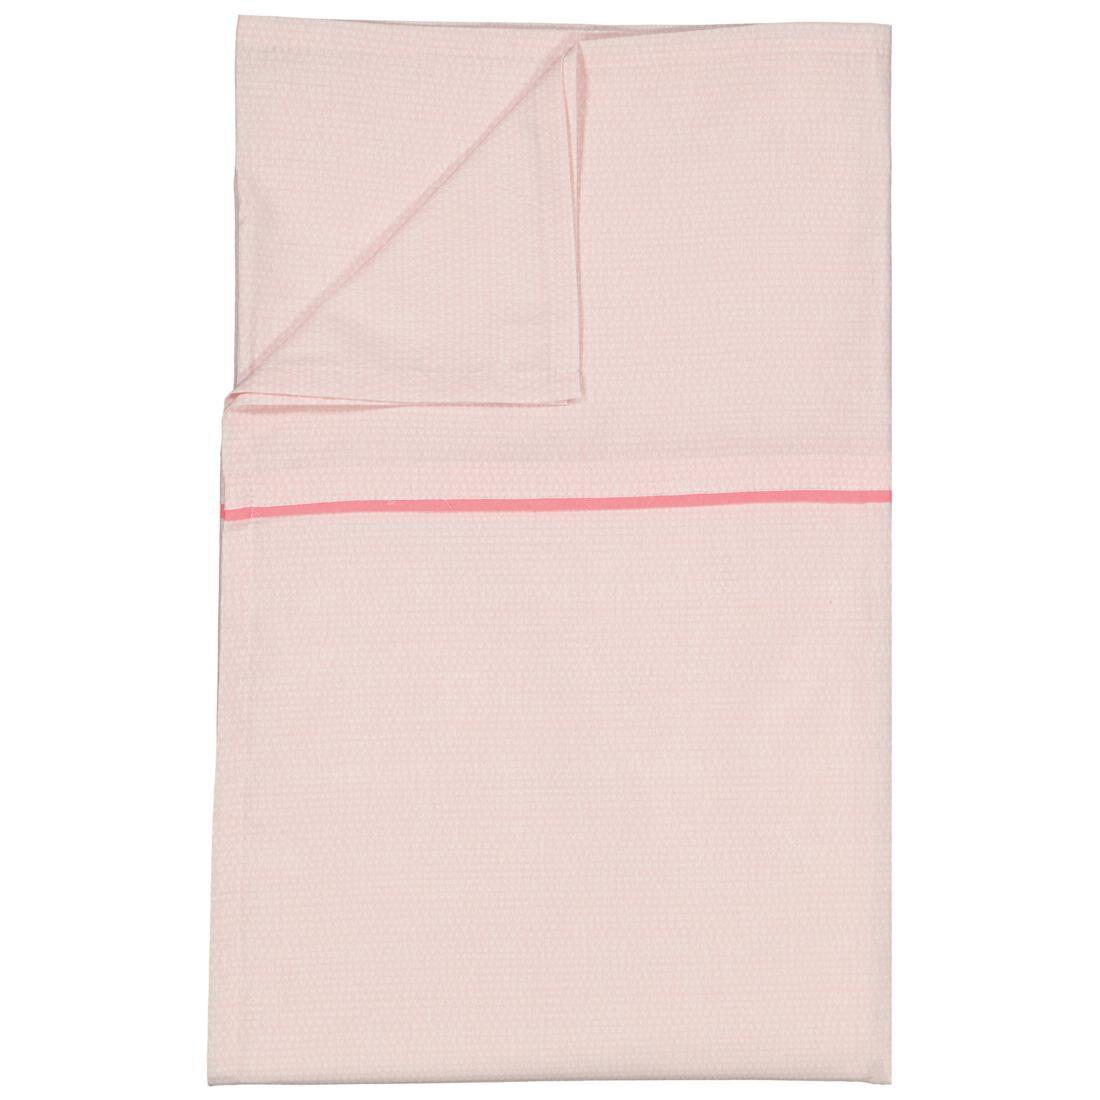 HEMA Ledikantlaken 120x150 - Roze (roze)